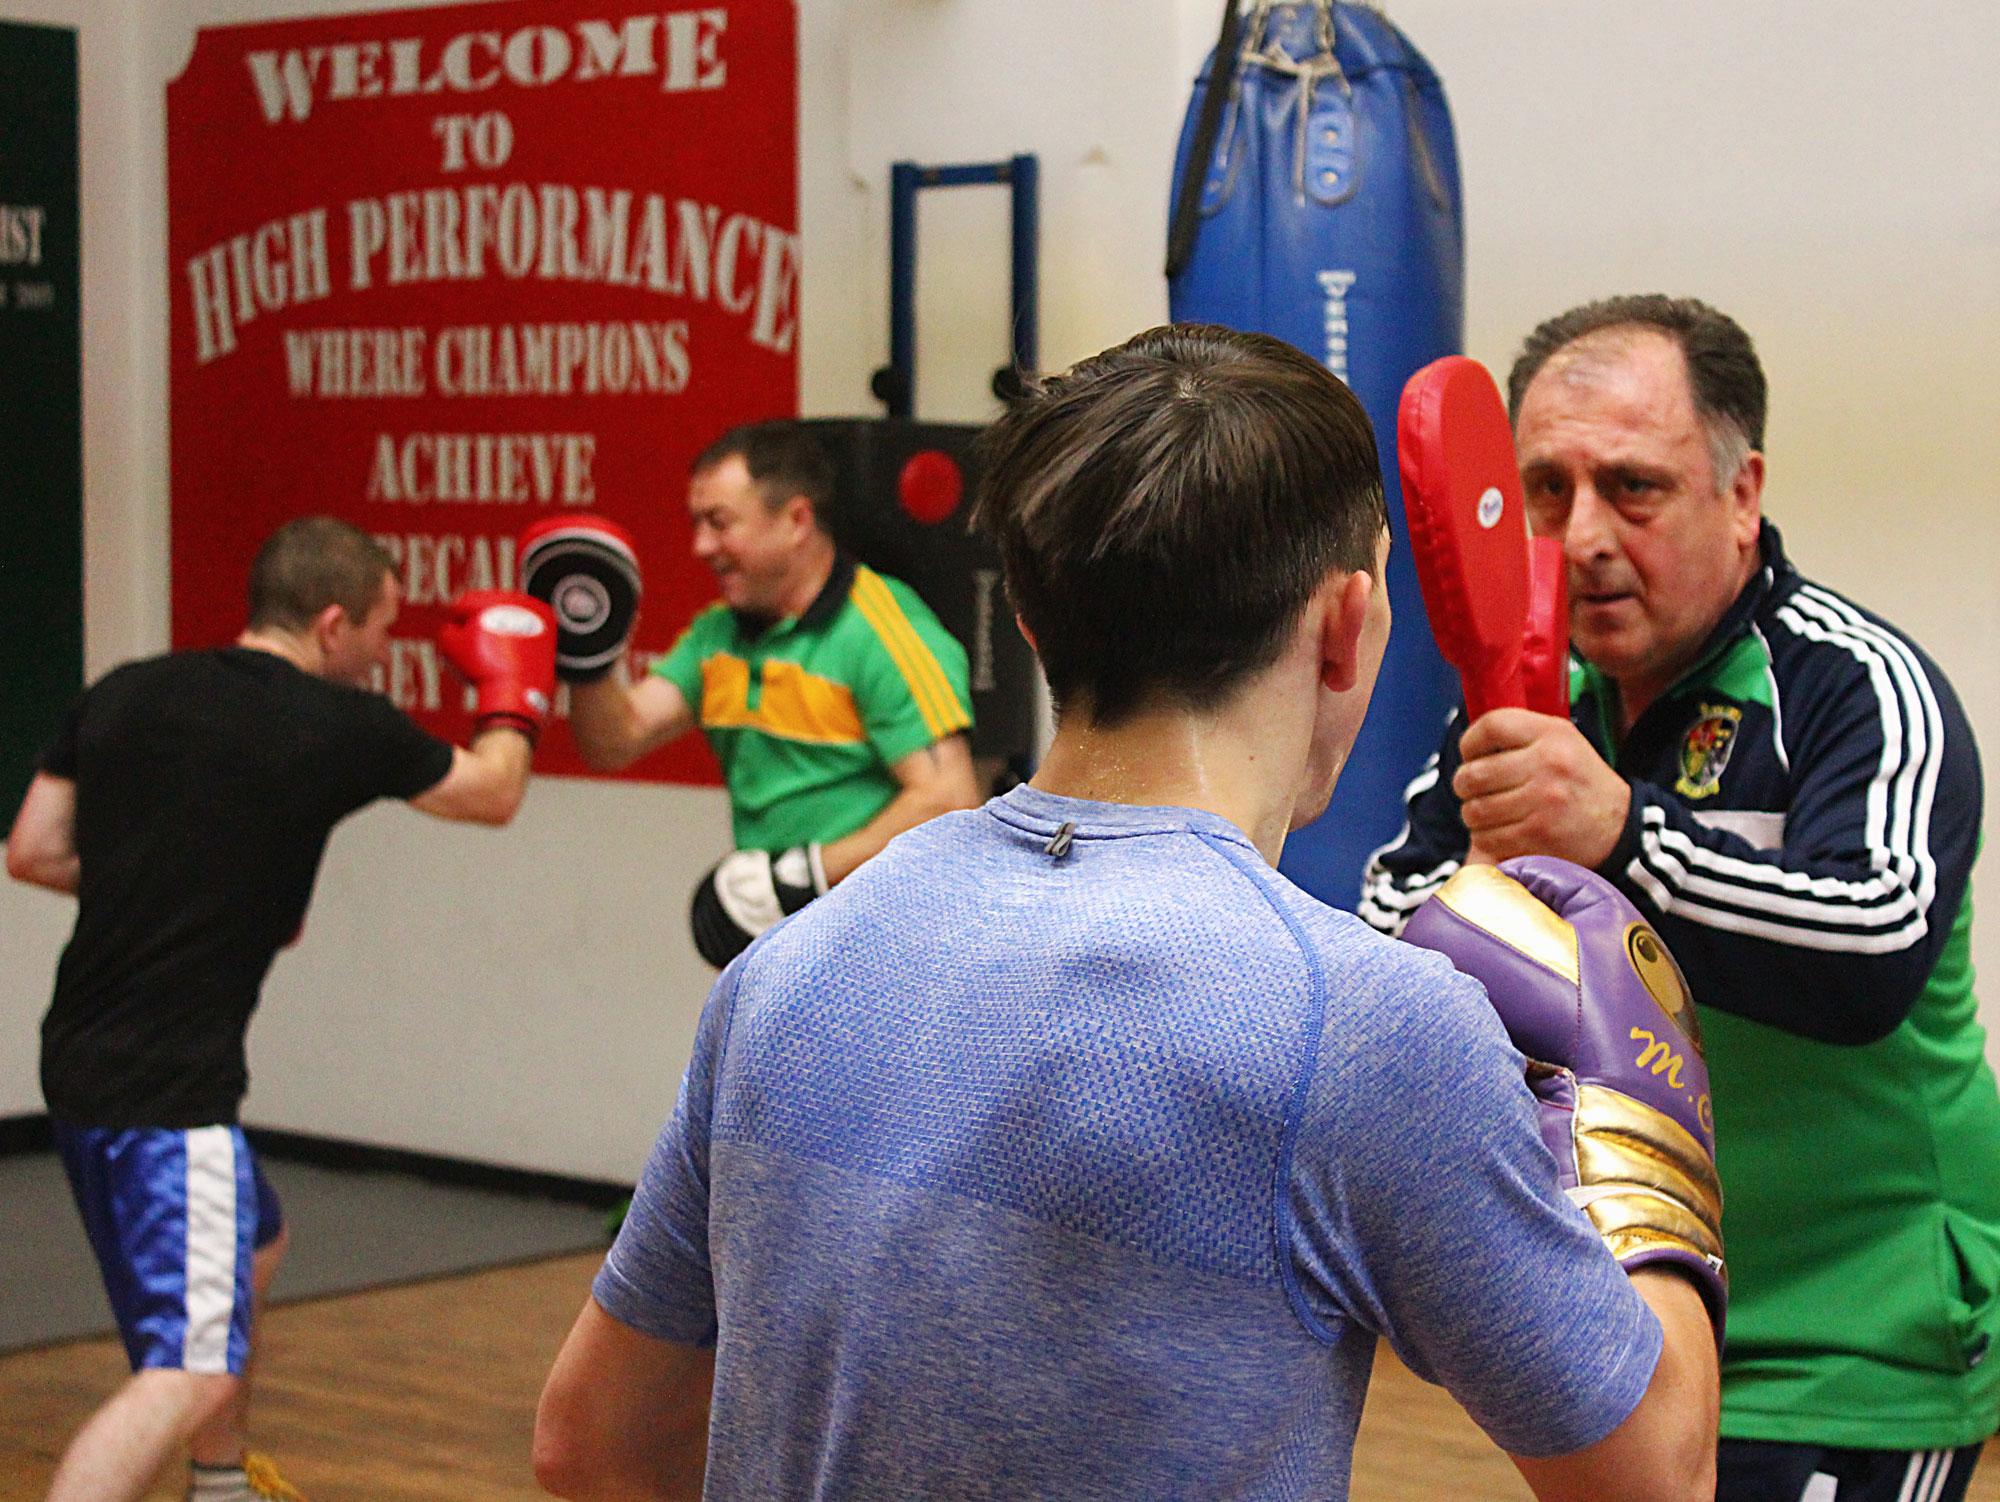 Michael Conlan & Paddy Barnes sparring